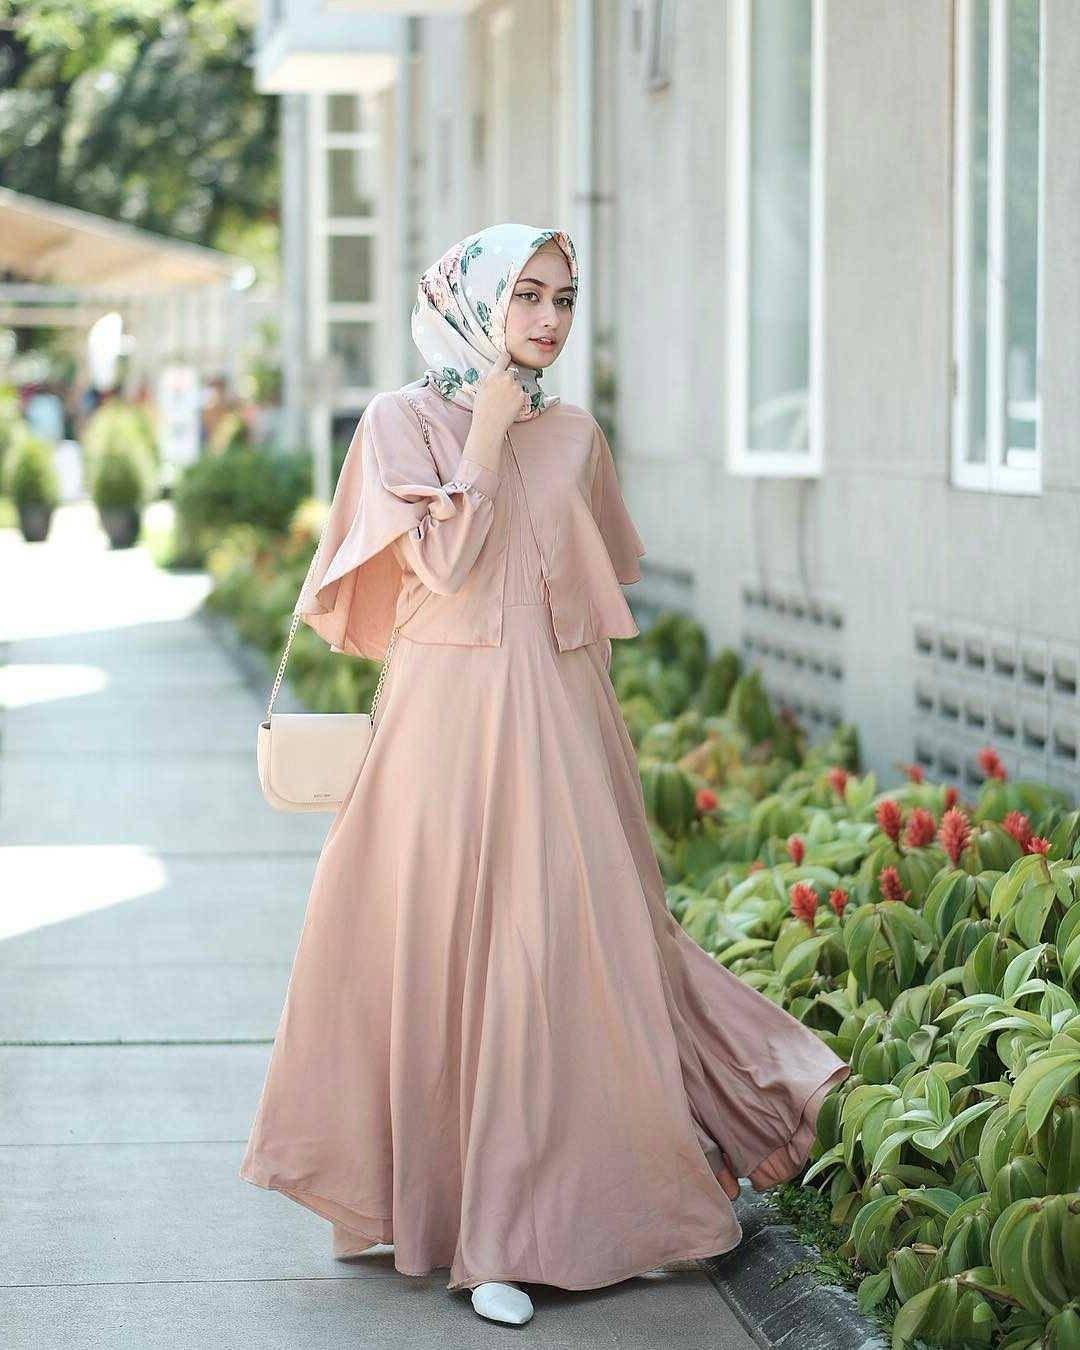 Inspirasi Model Baju Lebaran Syahrini 2017 8ydm 21 Model Gamis Lebaran 2018 Desain Elegan Casual Dan Modern